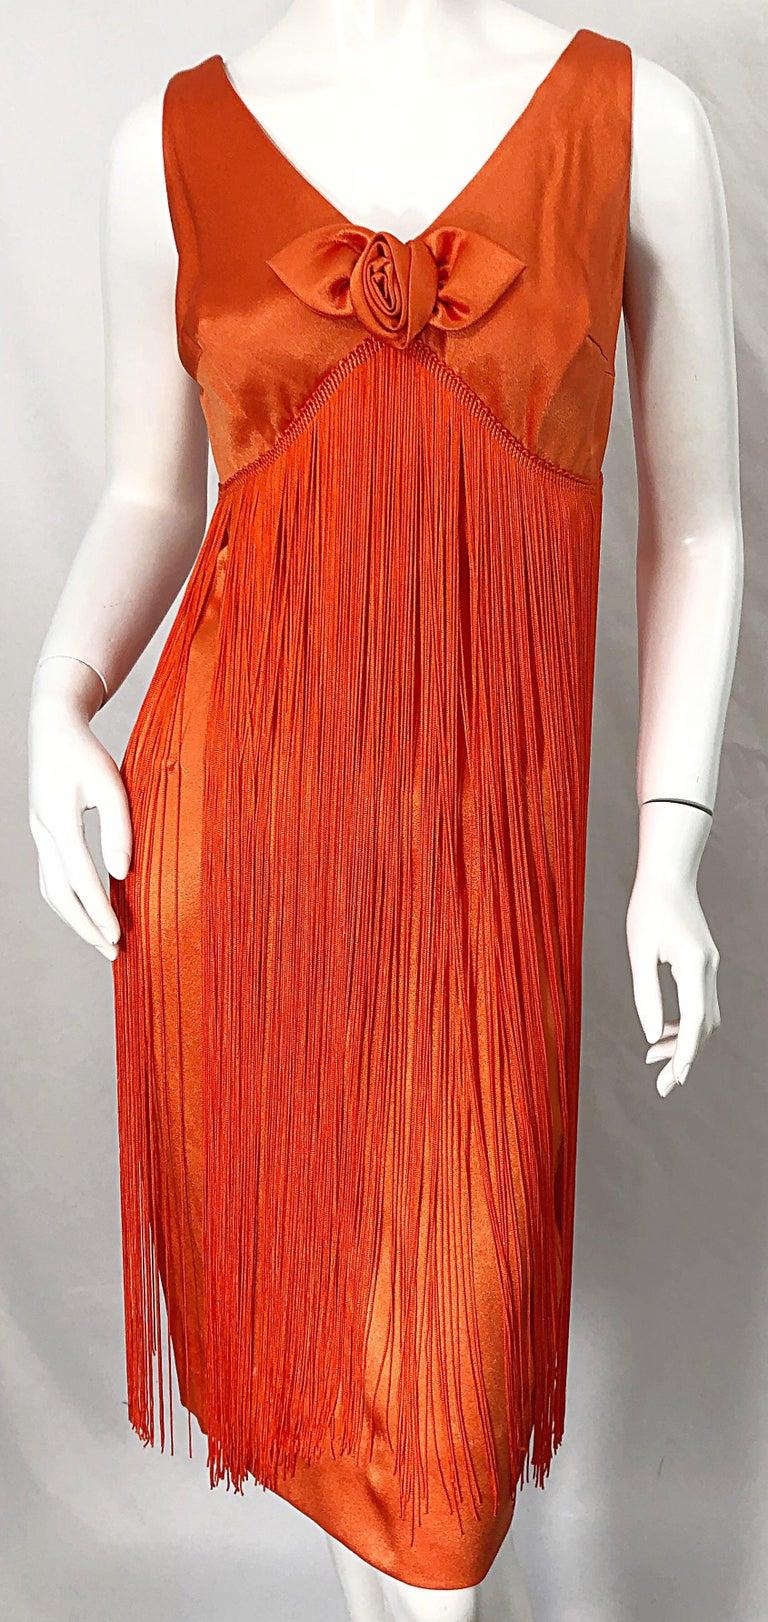 1960s Joseph Magnin Neon Orange Fully Fringed Vintage 60s Flapper Dress For Sale 2